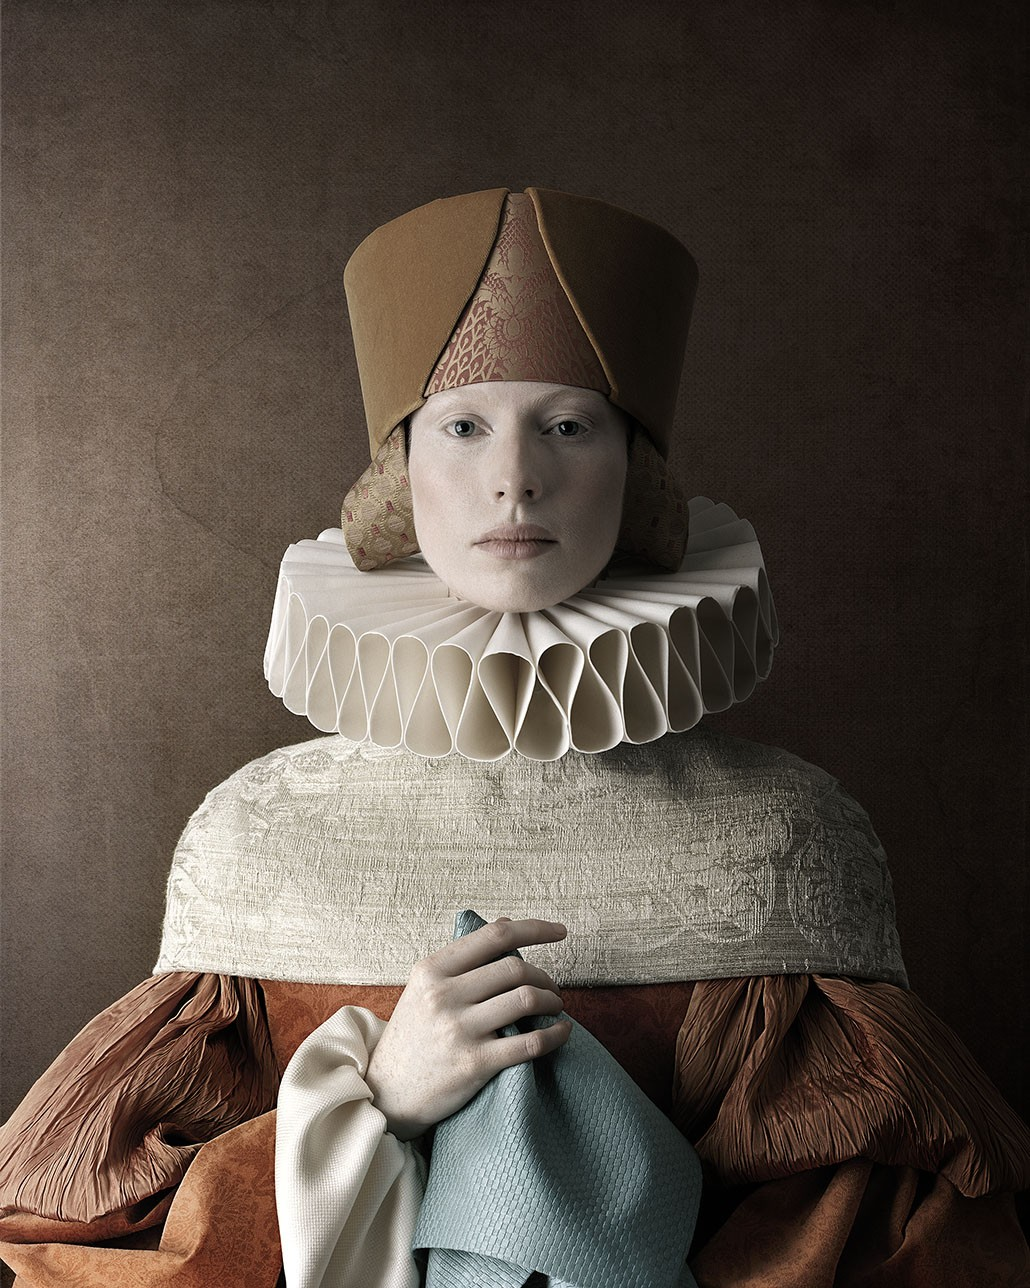 C.Tagliavini, 1503, Cecilia 2014